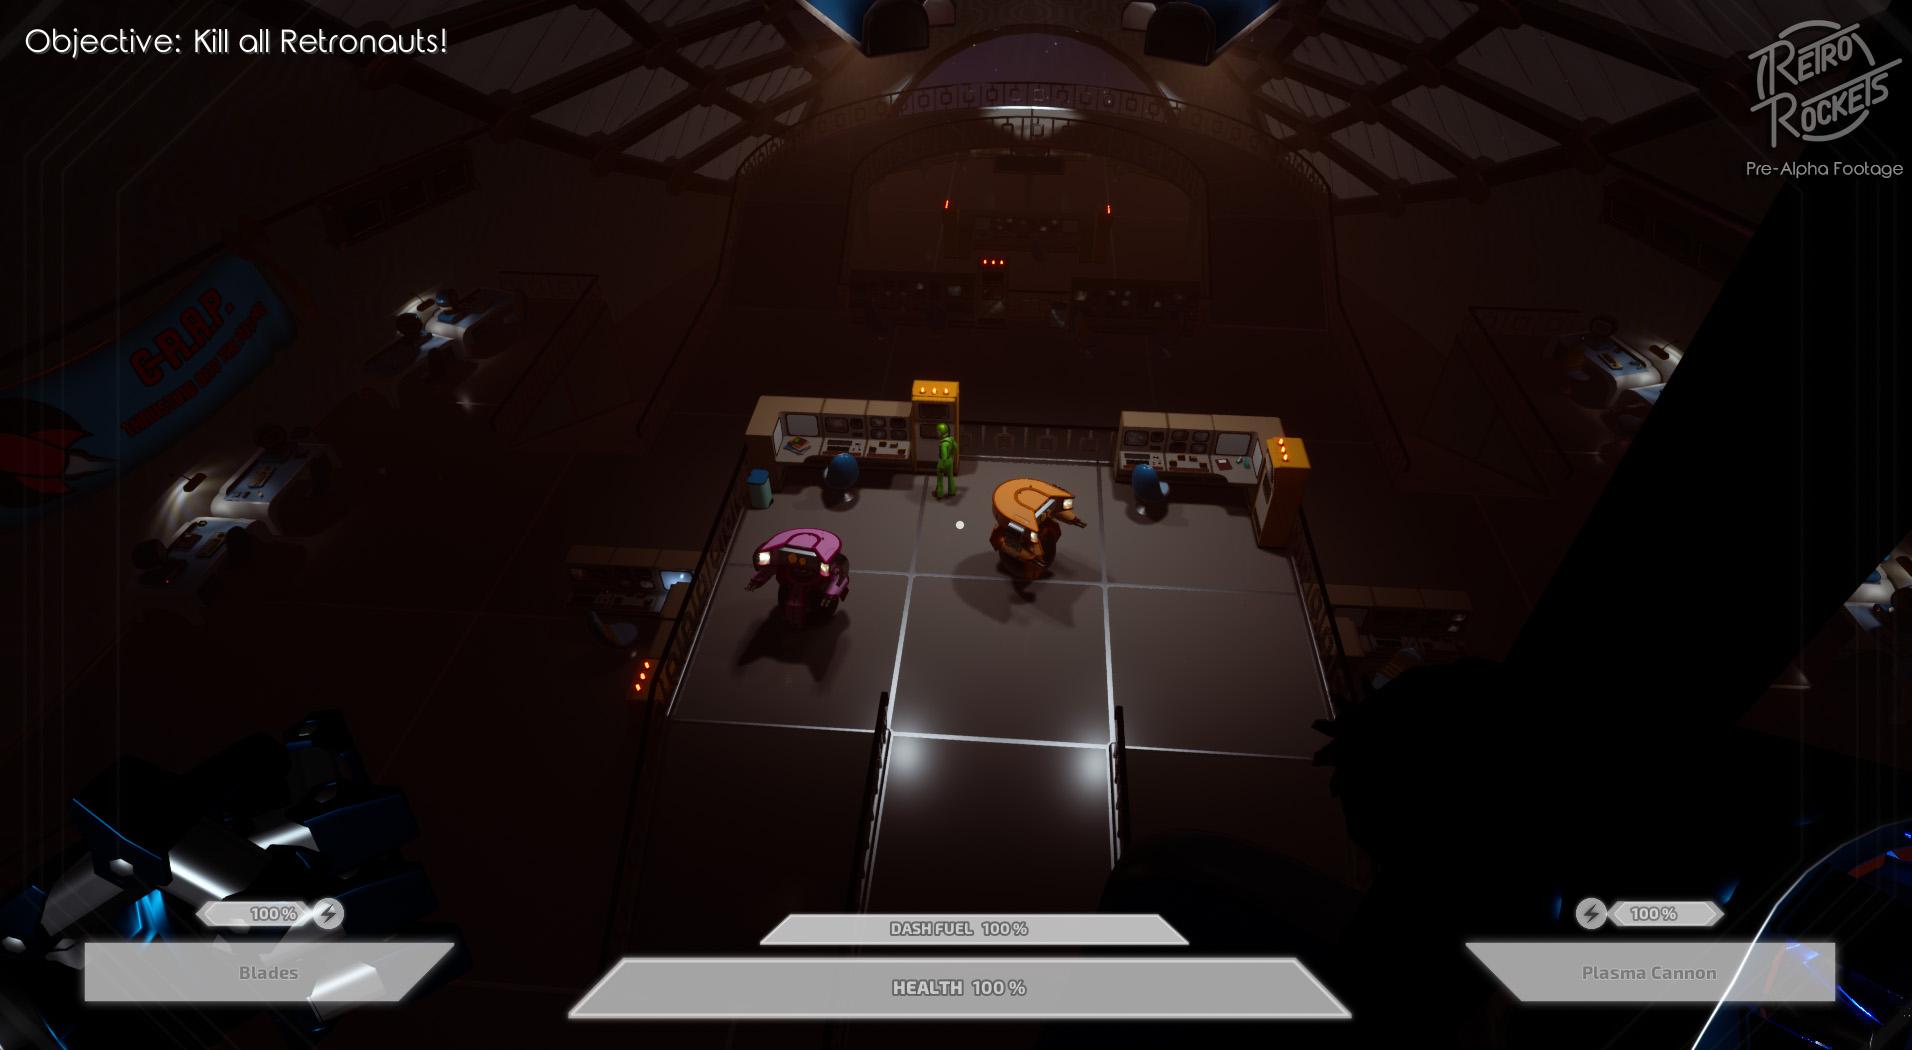 gameplayScreenshot_06.jpg